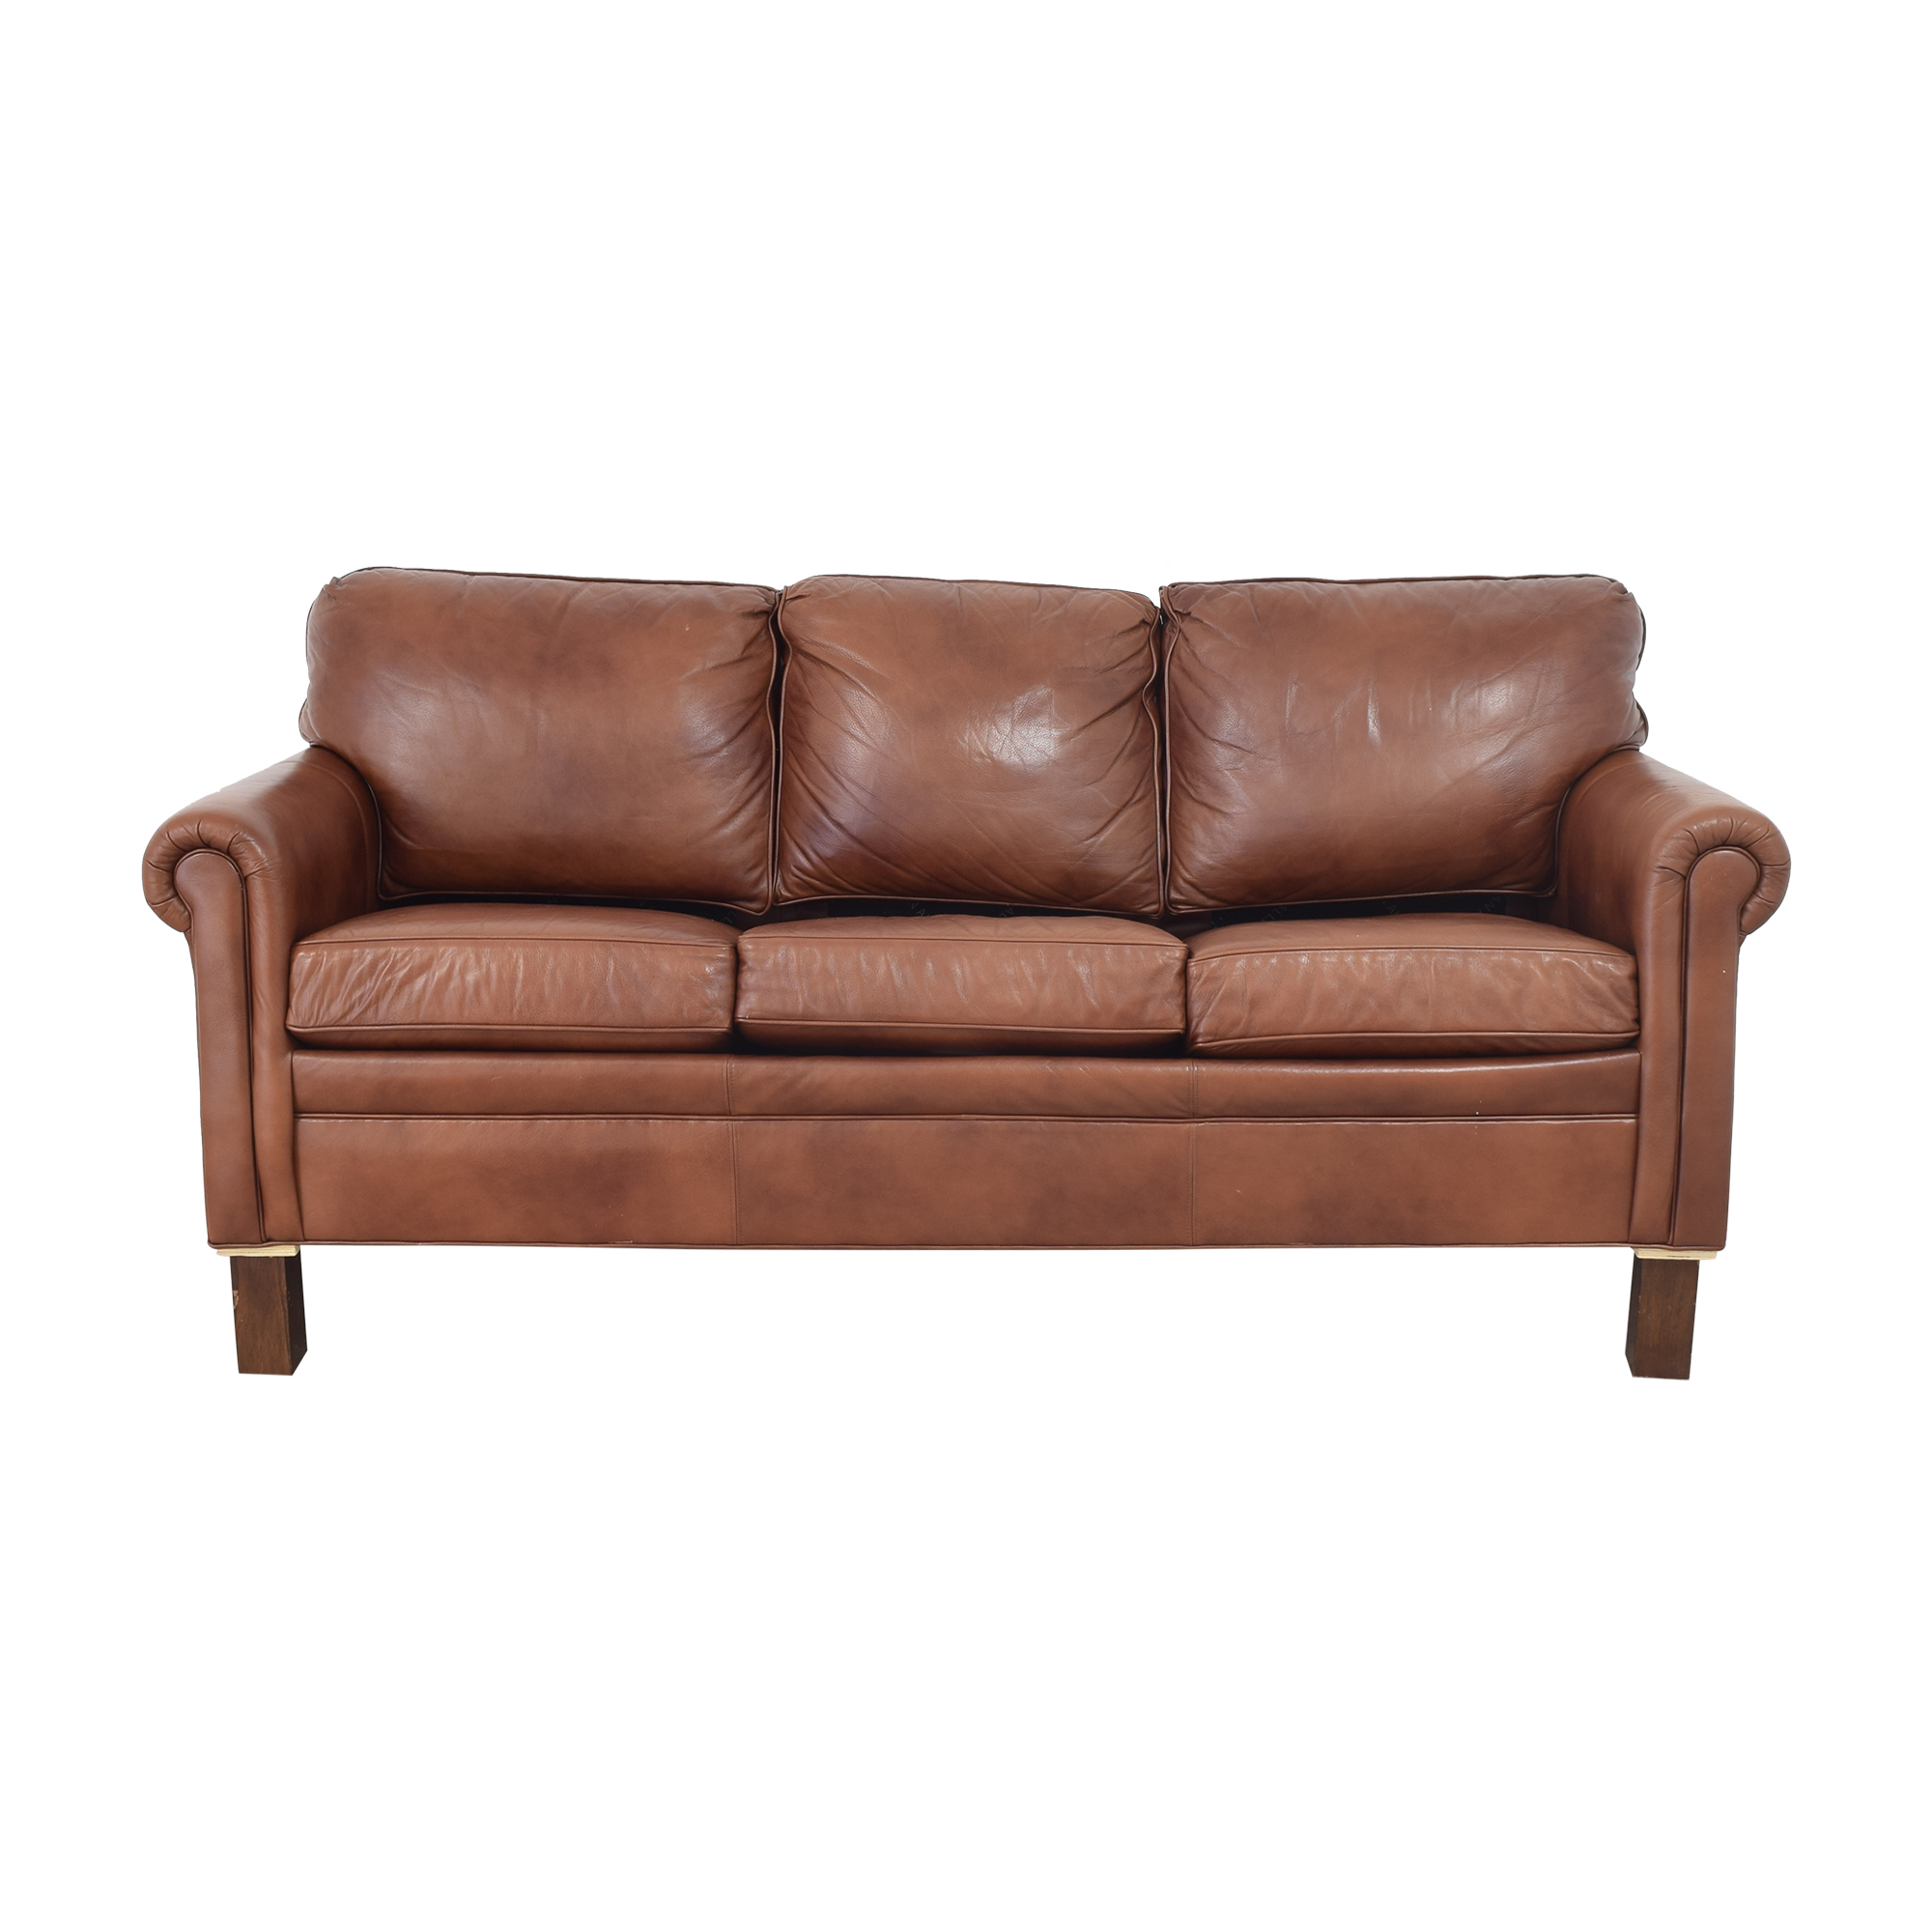 Ethan Ellen Three Cushion Sleeper Sofa / Sofas